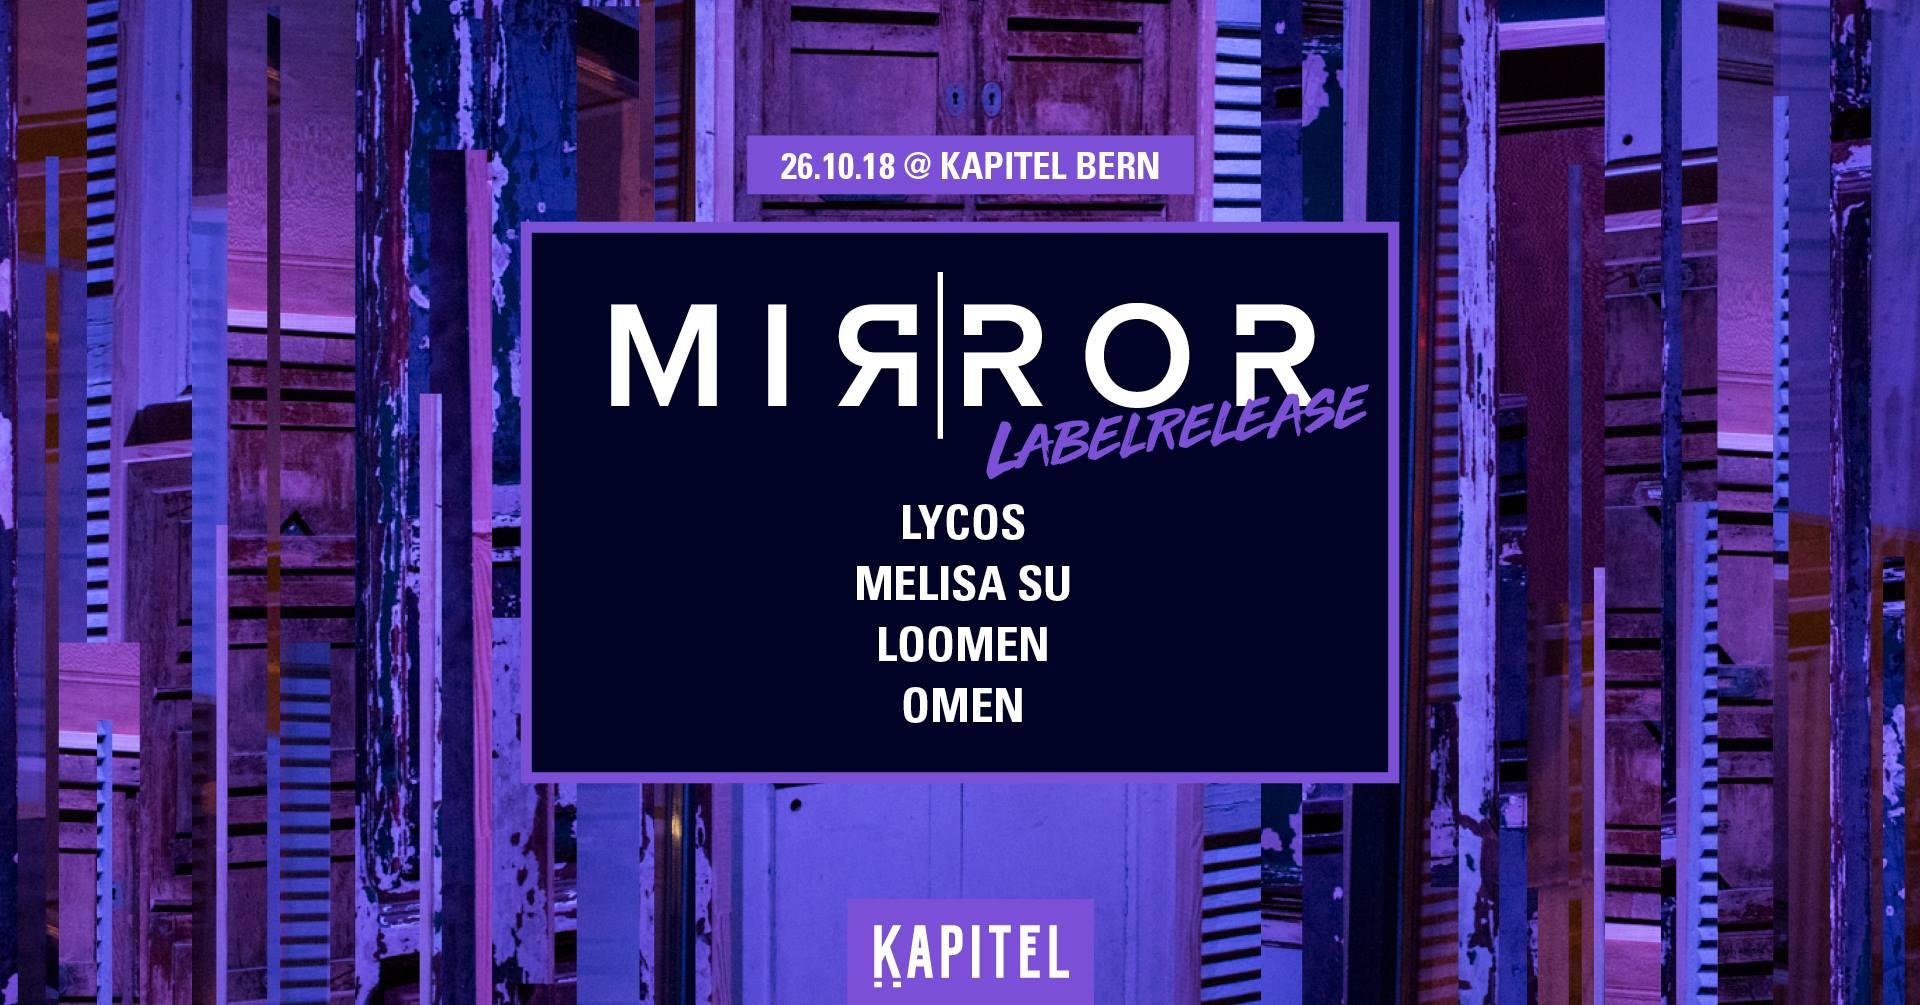 mirror-records-label-release-at-kapitel